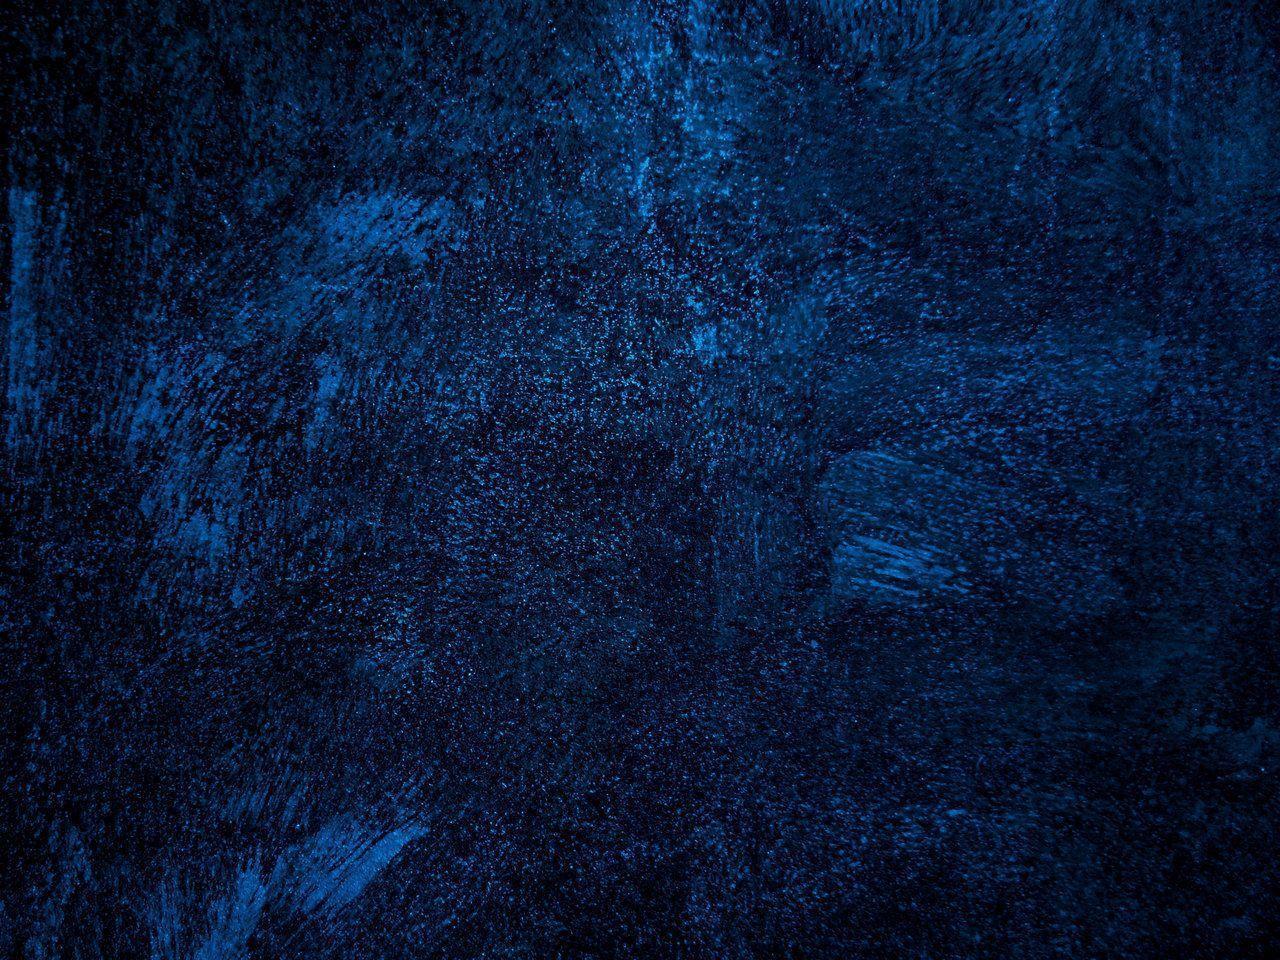 Dark Blue Backgrounds 1280x960